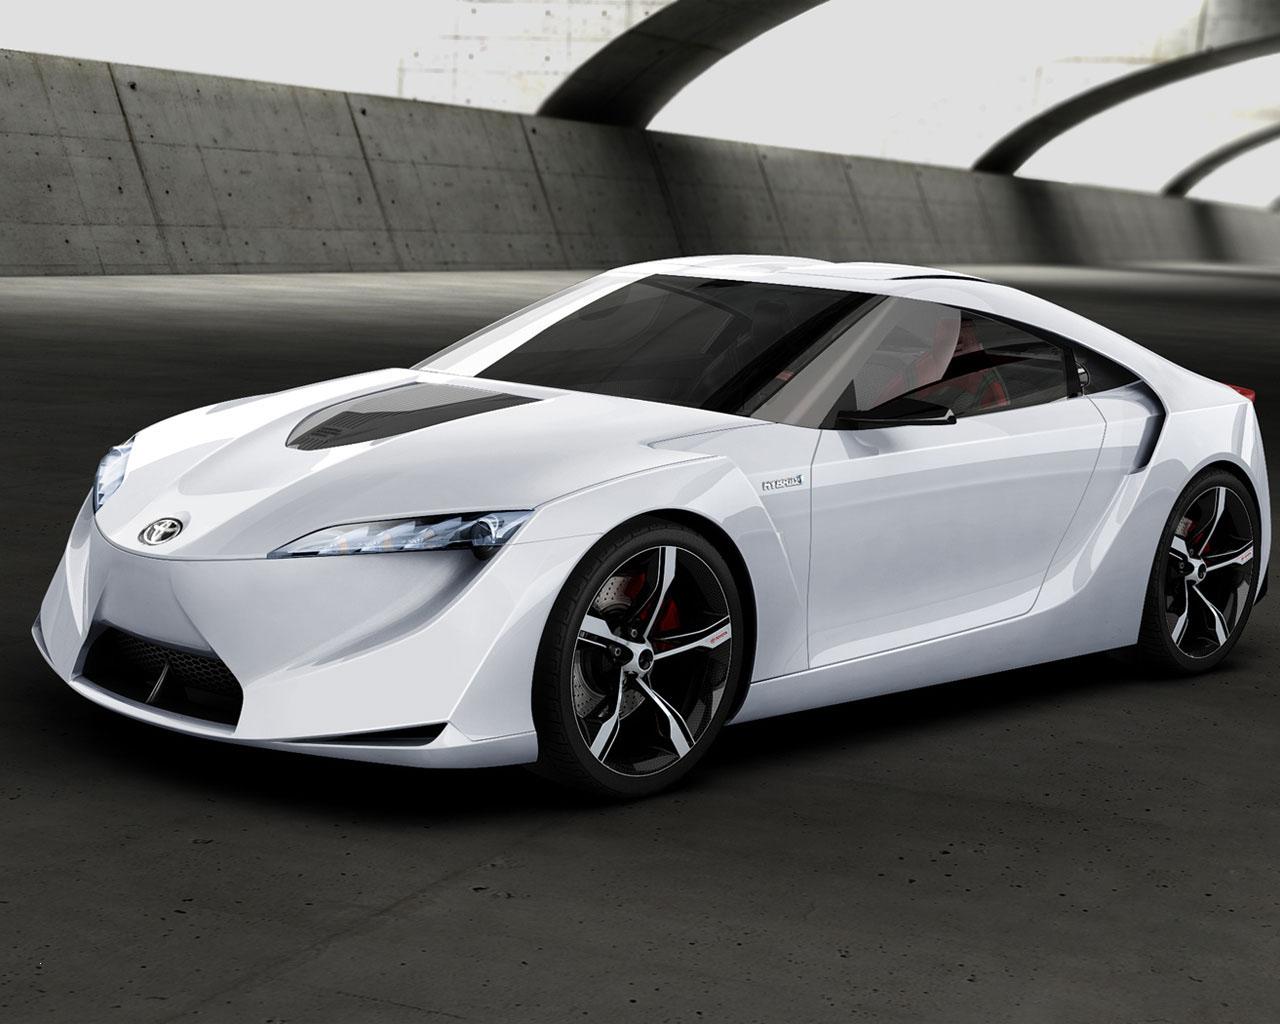 Super Sport Cars 2012: Futuristic Toyota FT-HS Hybrid